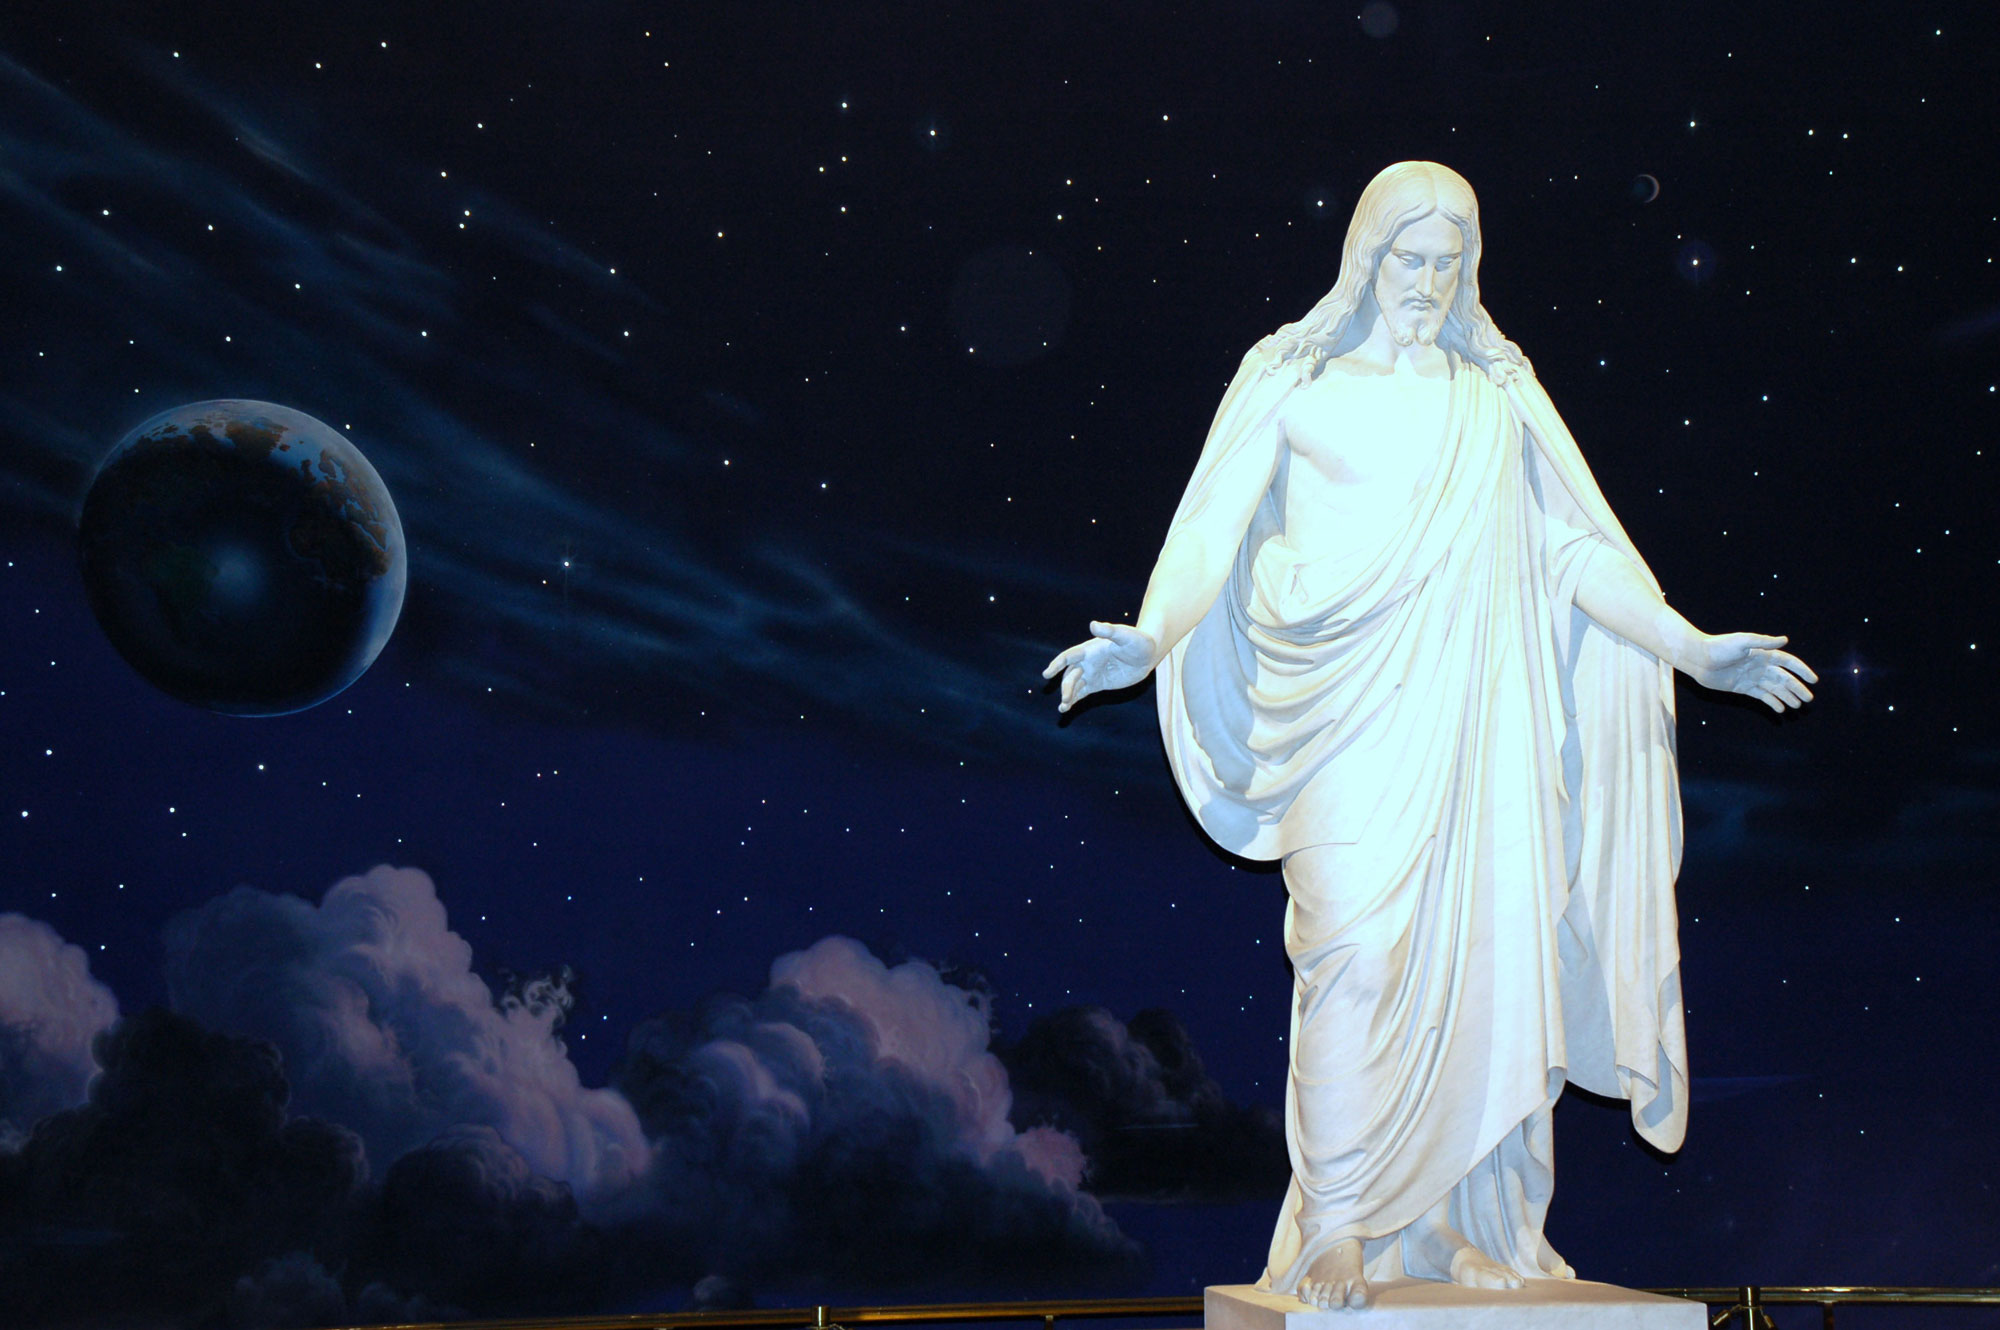 Christus by Bertel Thorvaldsen